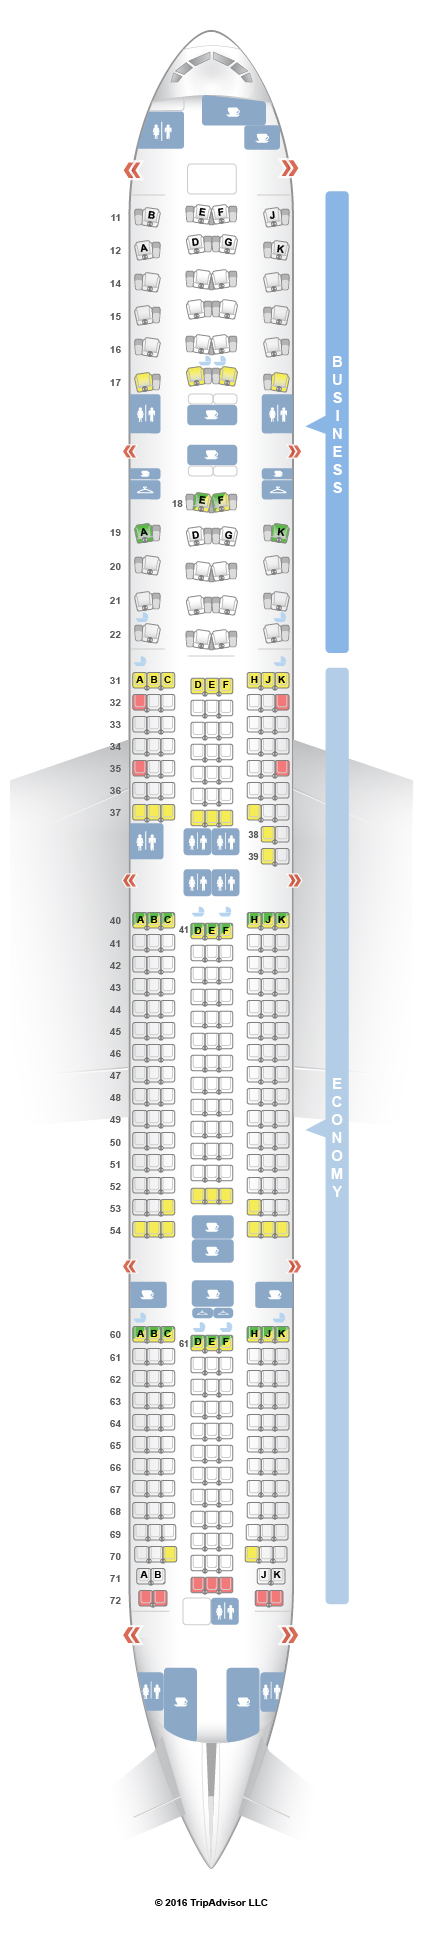 Seatguru seat map thai boeing 777 300er 77w for Plan cabine 777 300er